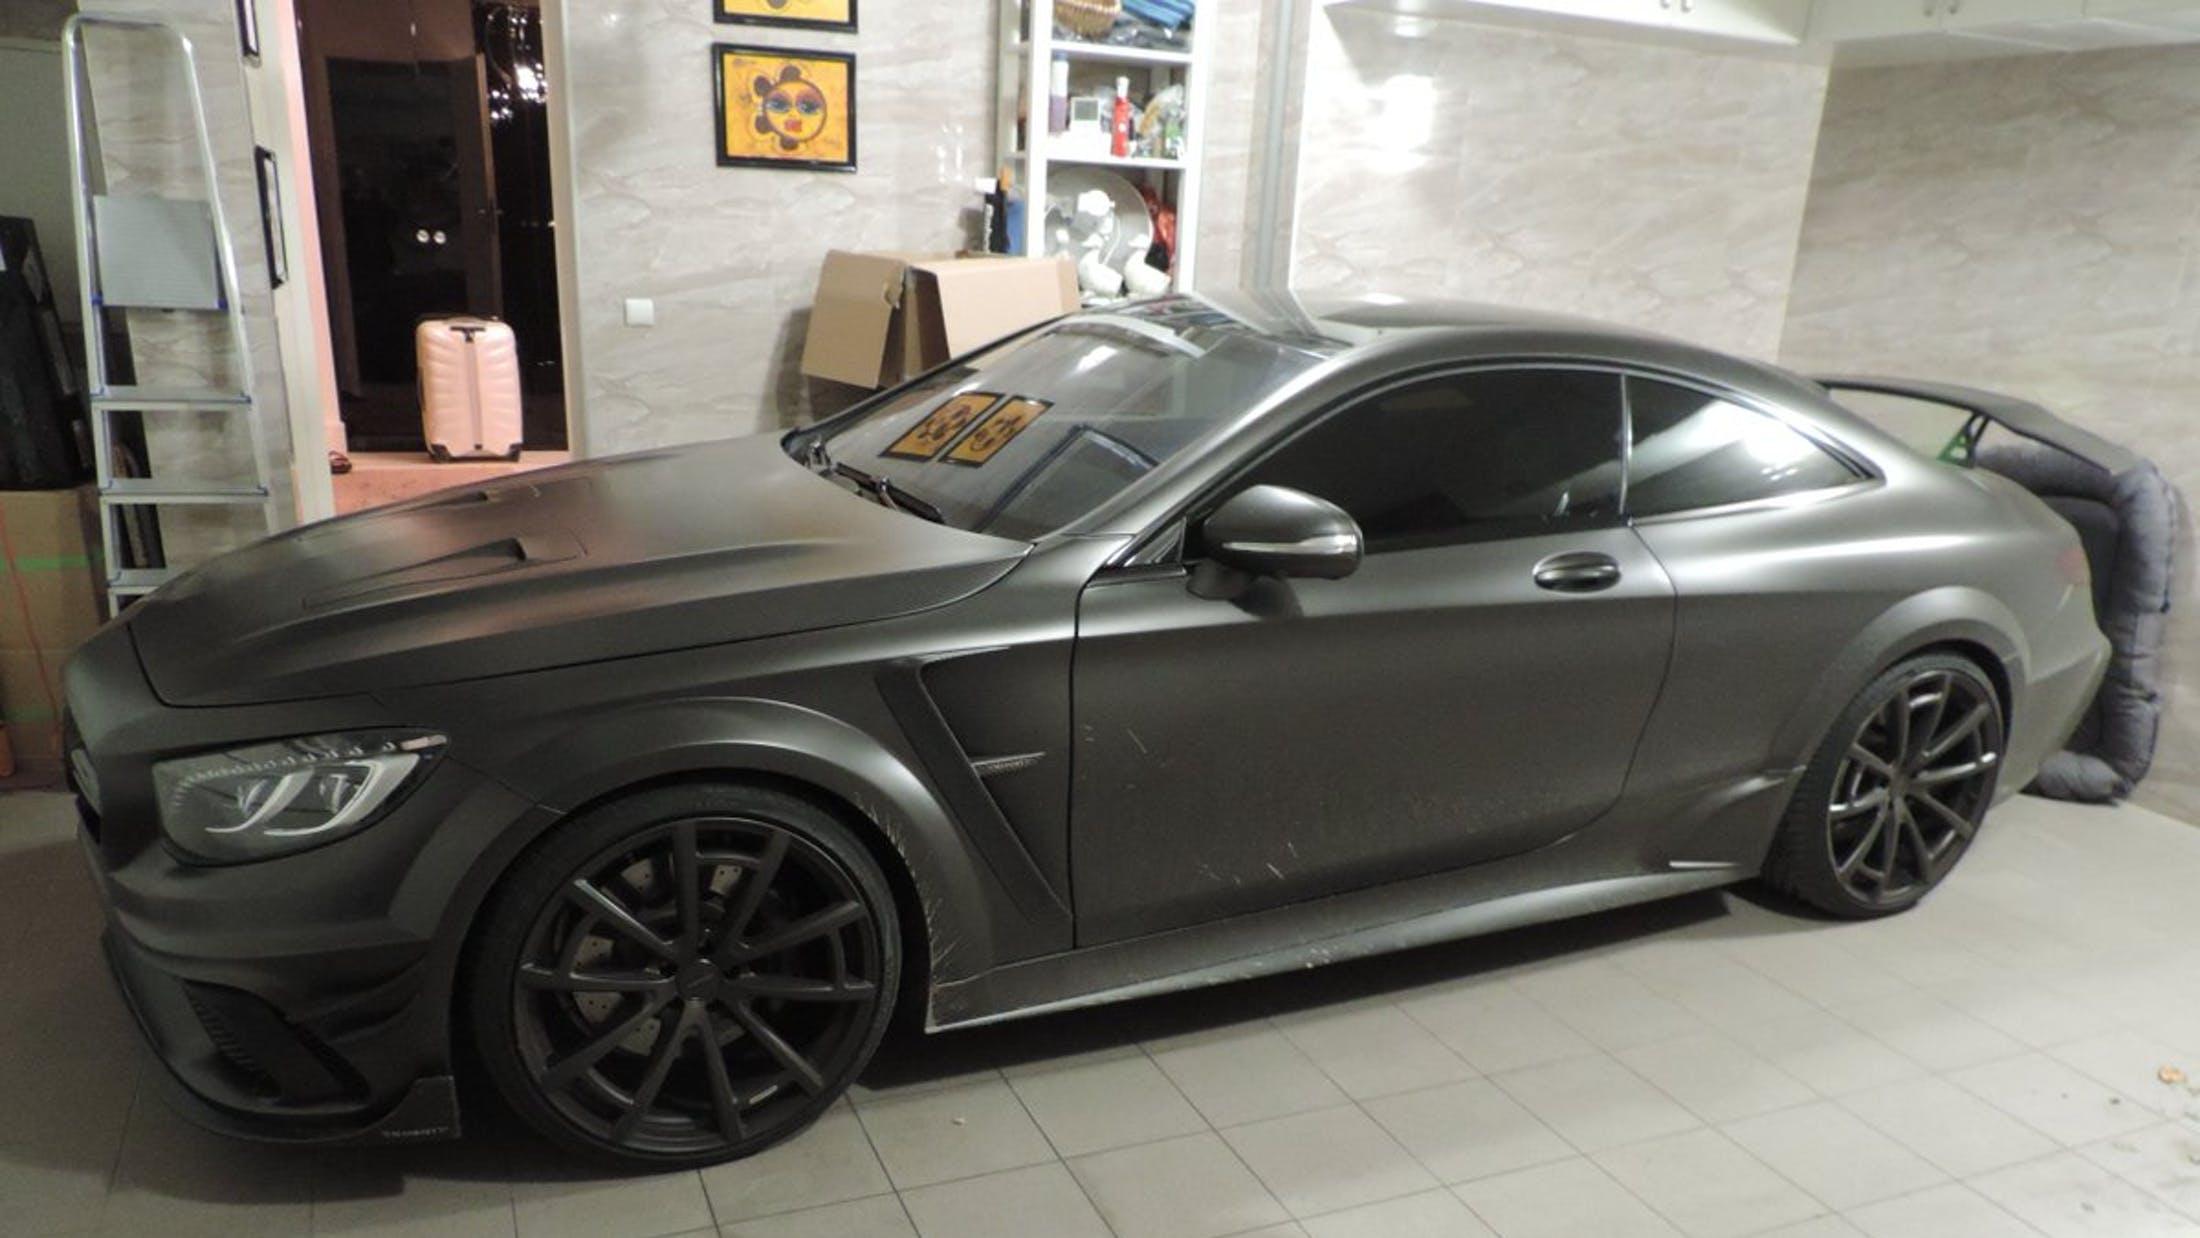 Polski rząd skonfiskował Mercedesa S63 AMG Coupe Black Edition Mansory